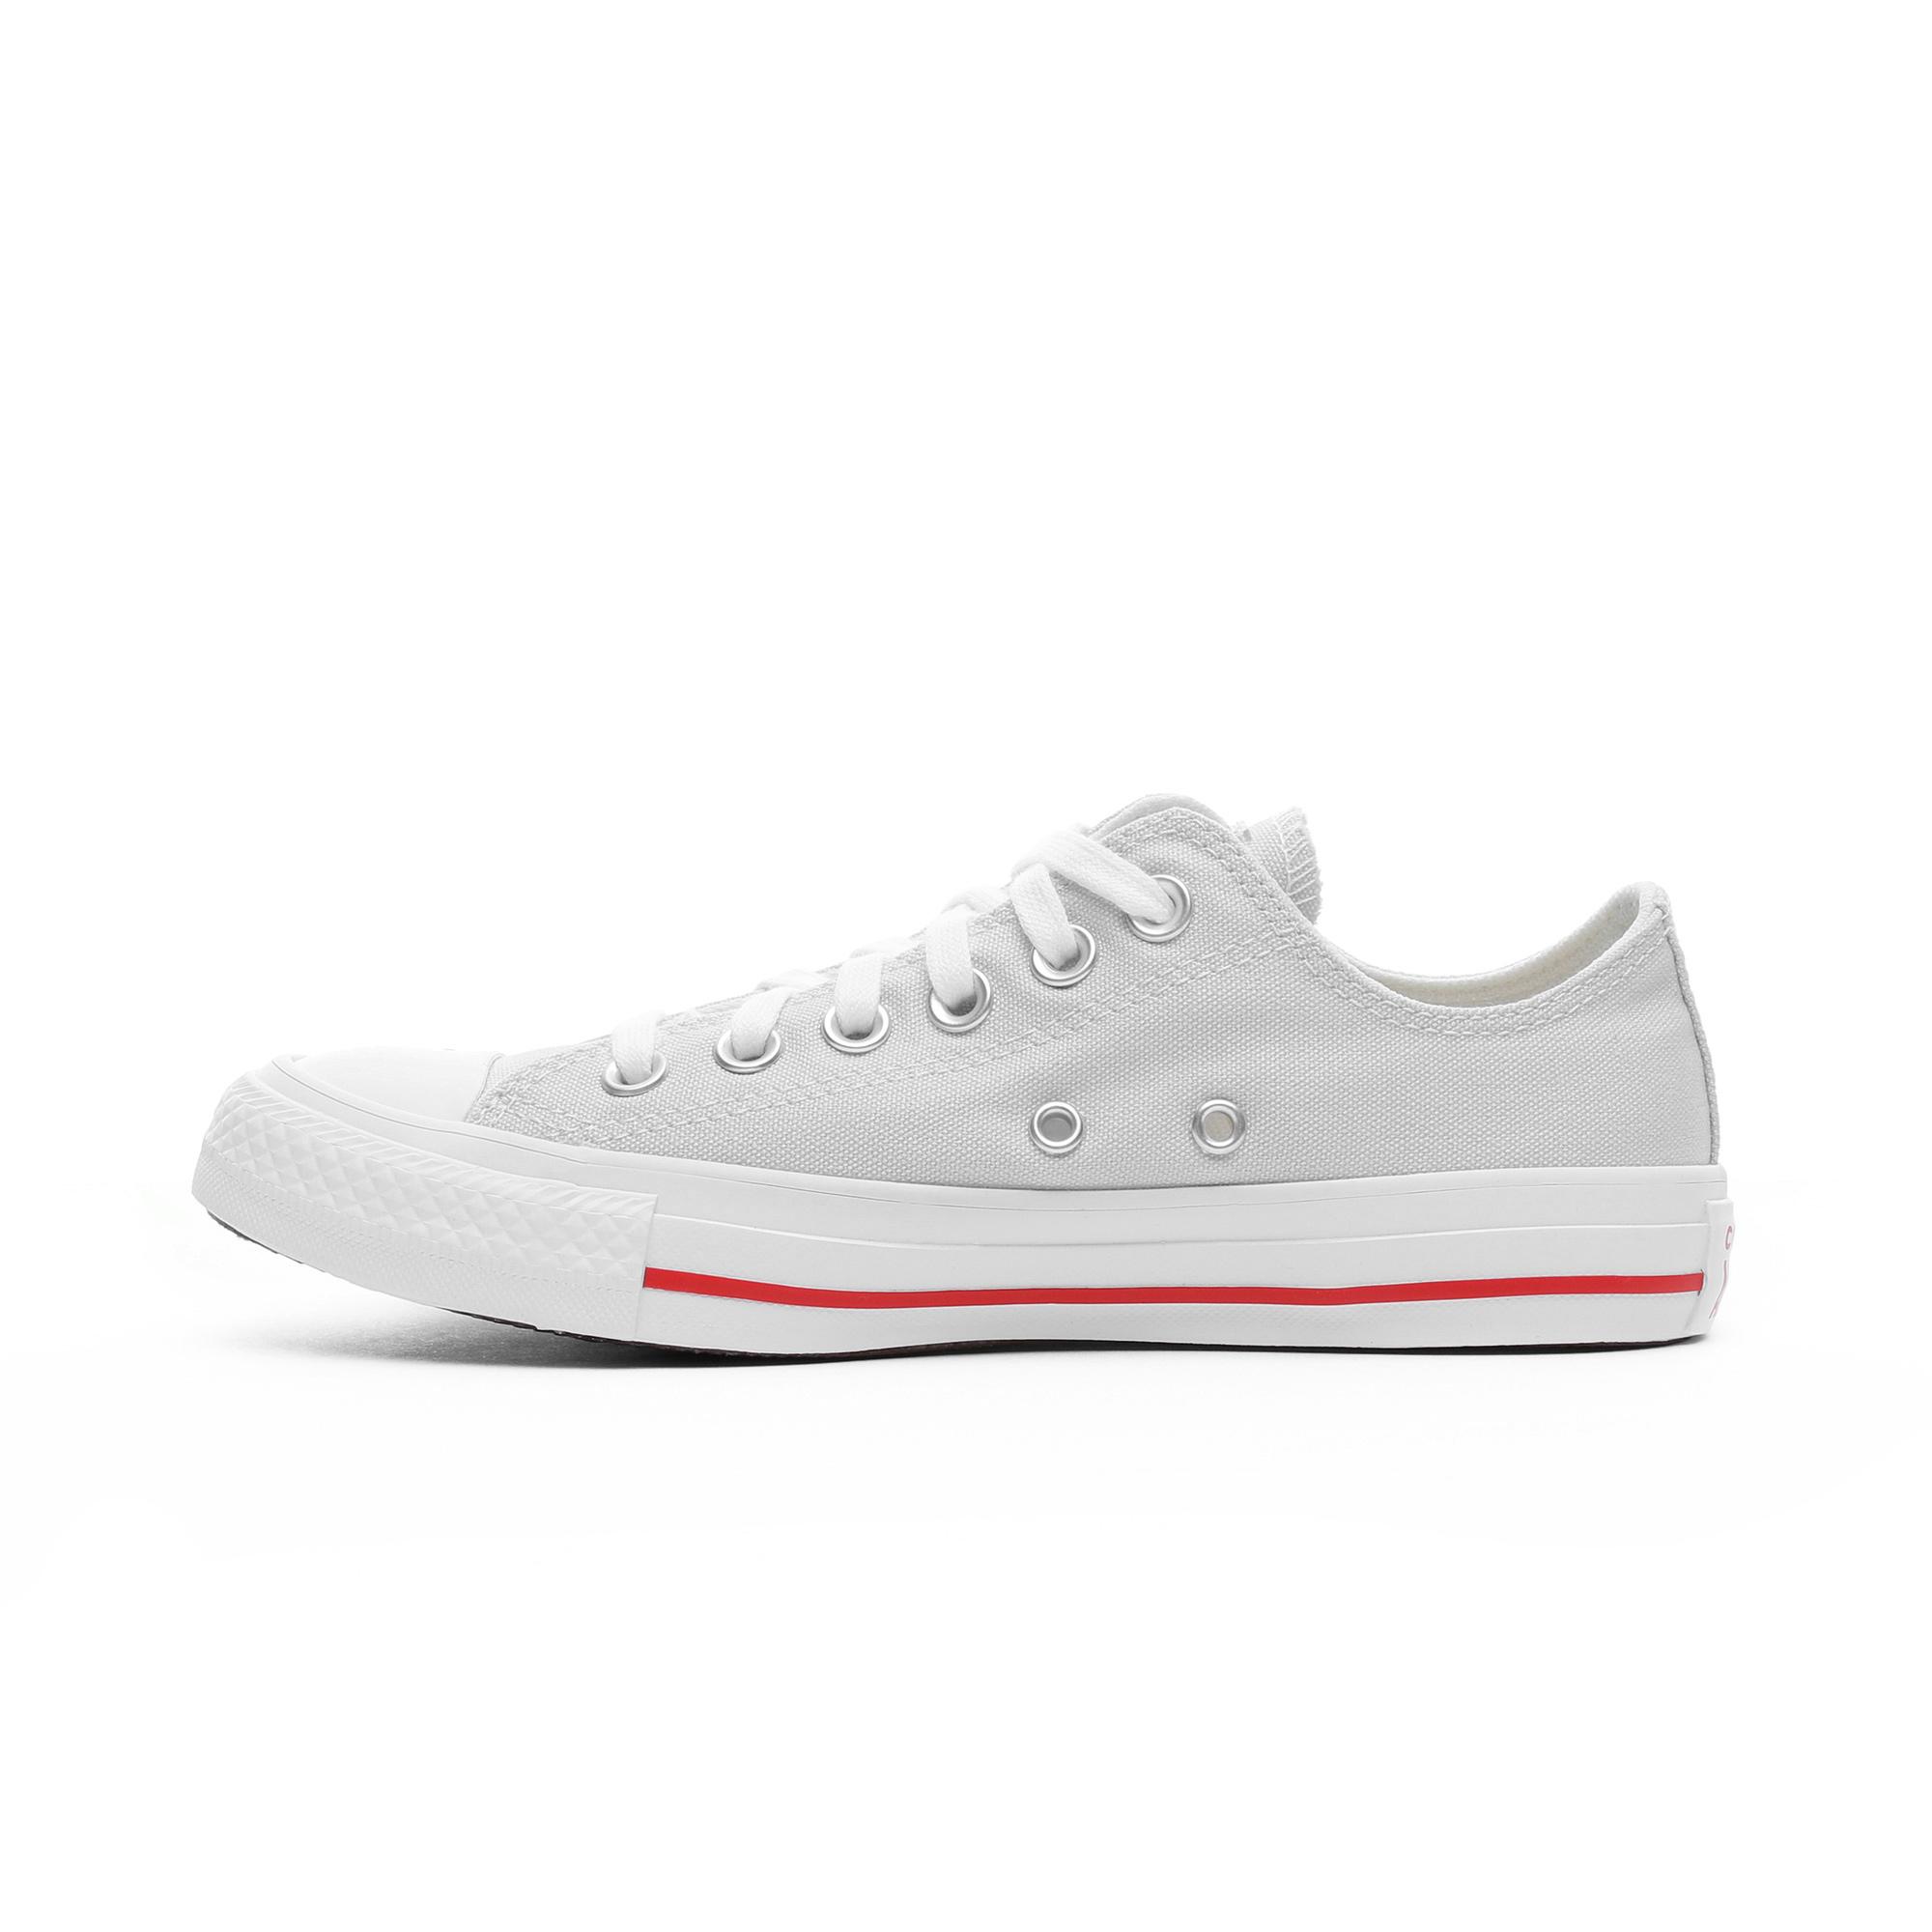 Converse Love Fearlessly Chuck Taylor All Star Kadın Beyaz Sneaker